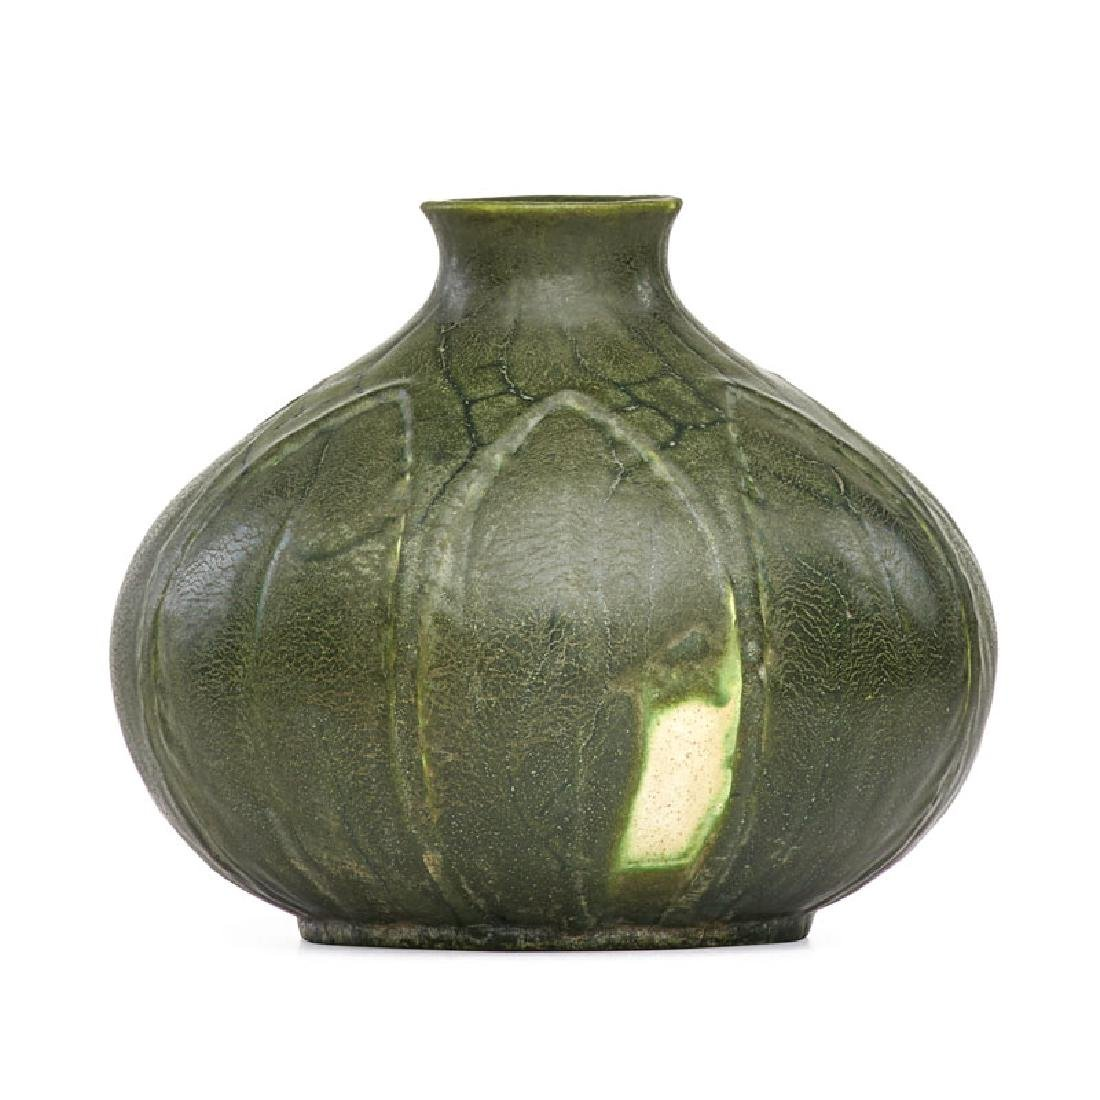 WILHELMINA POST; GRUEBY Vase with leaves